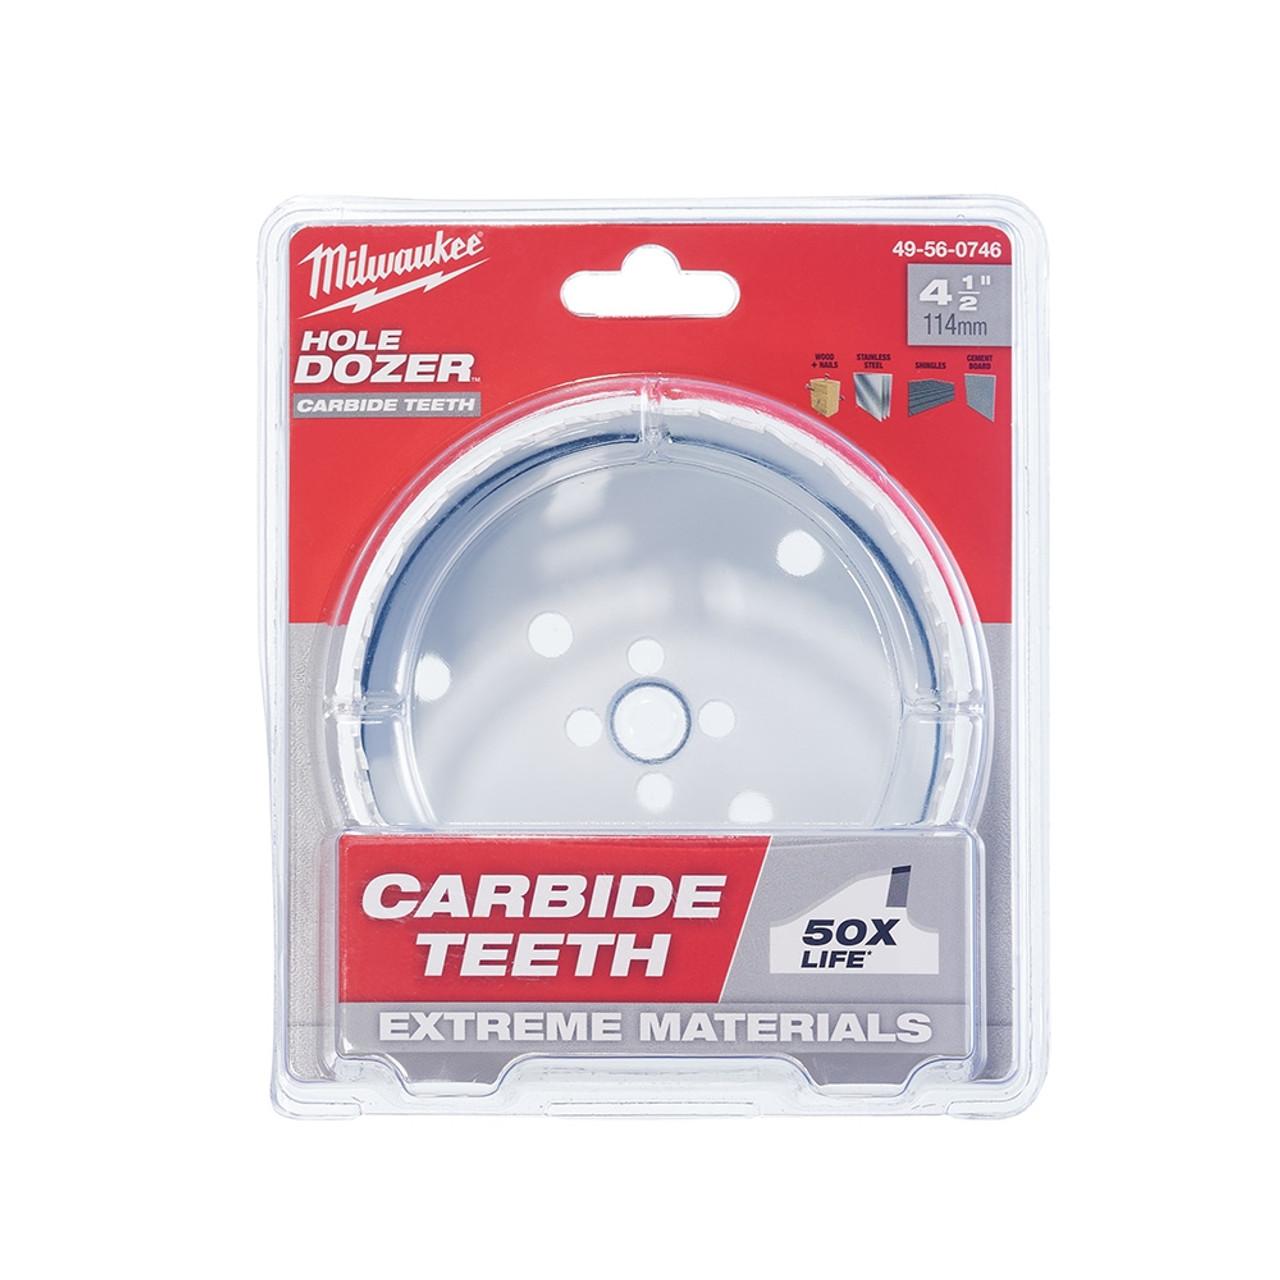 Milwaukee 49-56-0746 4-1/2 in. Hole Dozer with Carbide Teeth